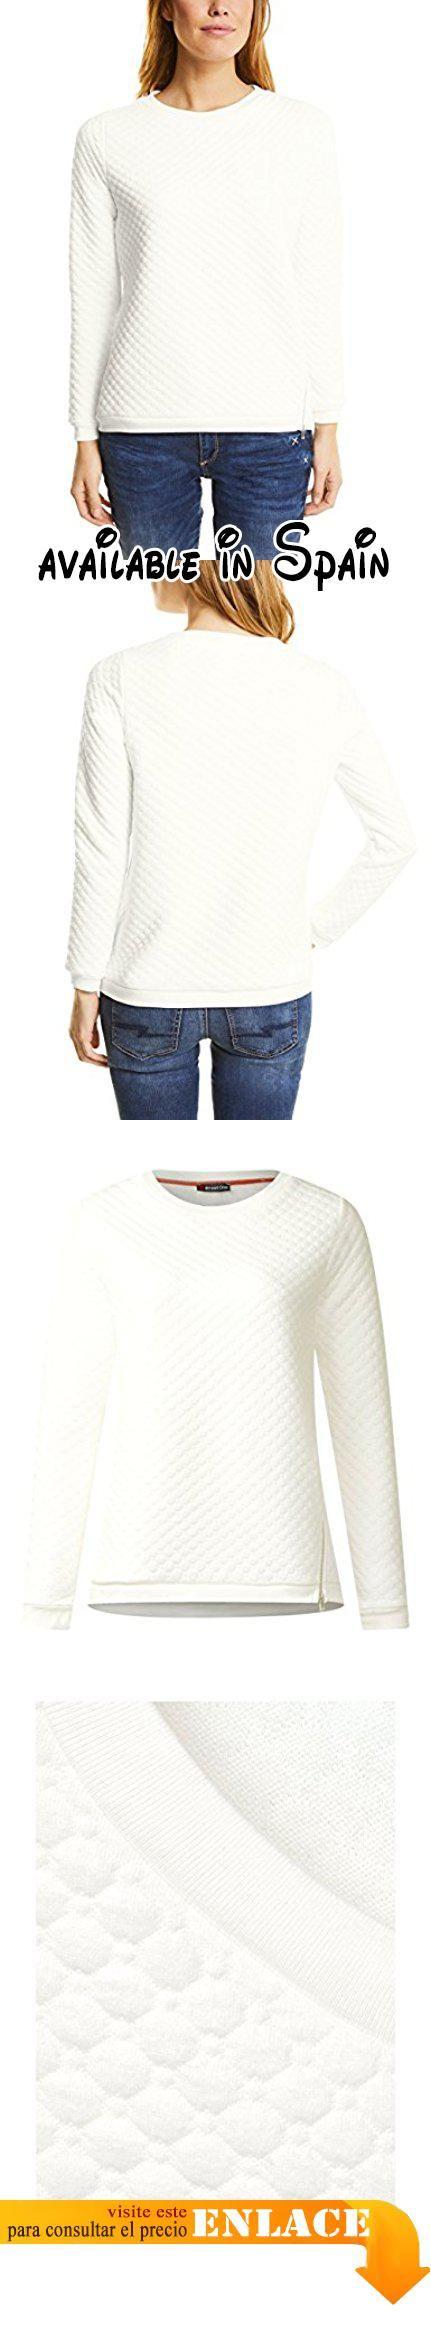 Street One 300379, Sudadera para Mujer, Weiß (Off White 10108), 42